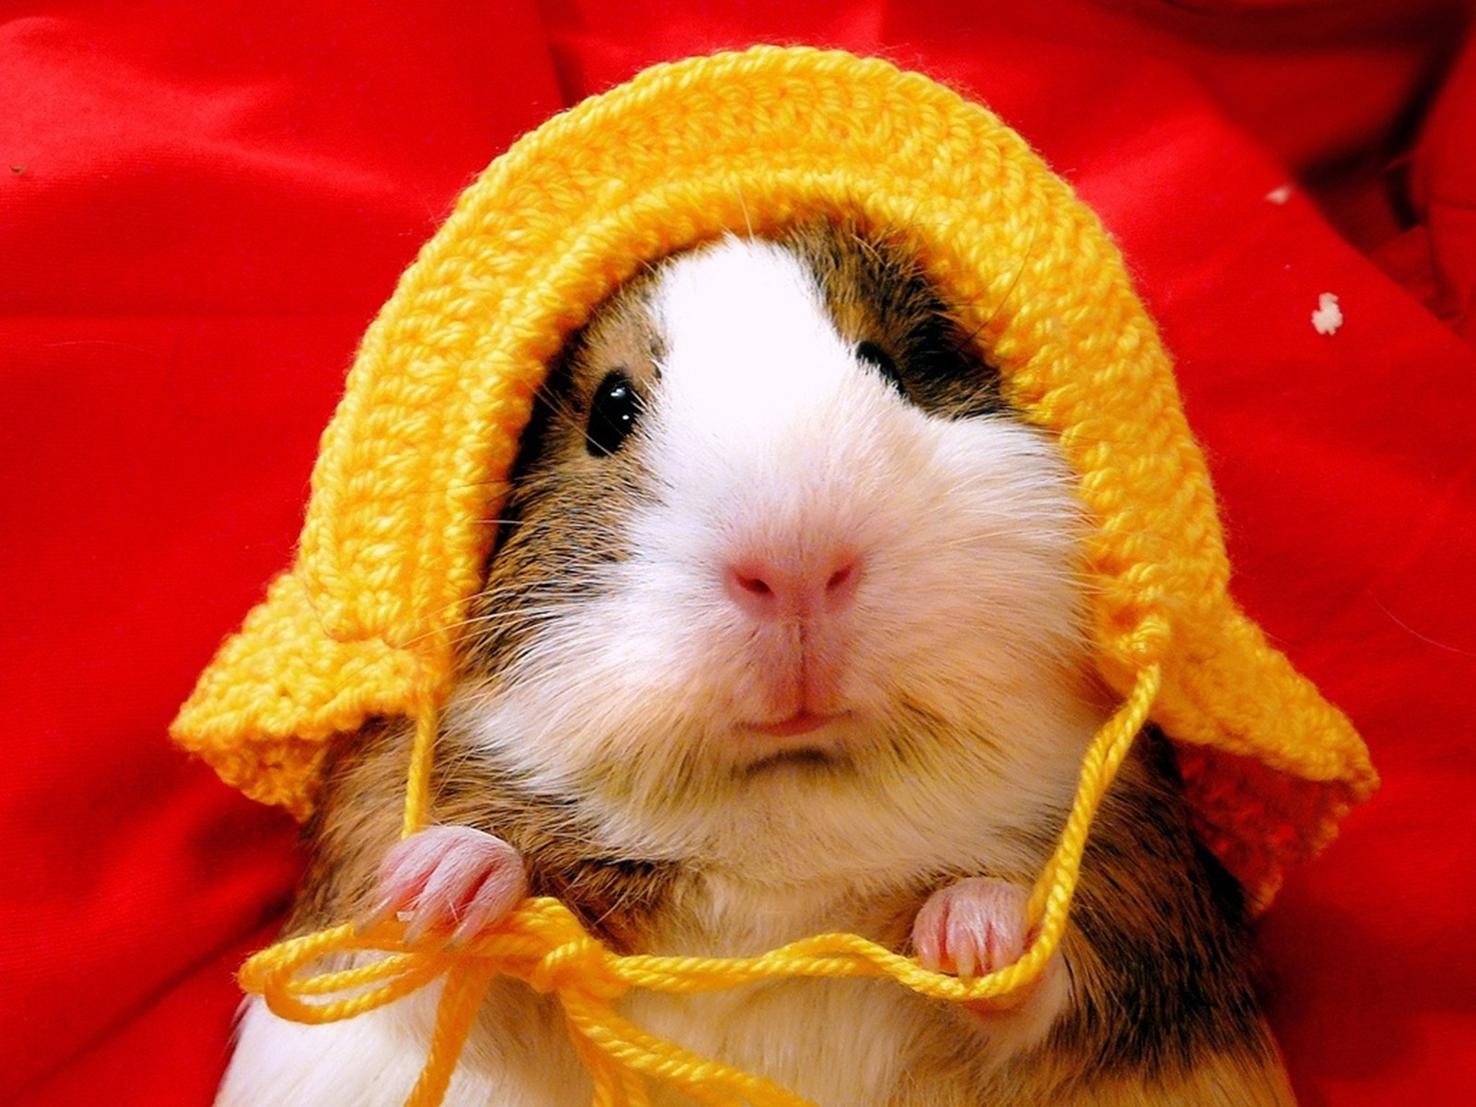 15 hamster wallpaper download 15 hamster hd widescreen wallpaper 1476x1107